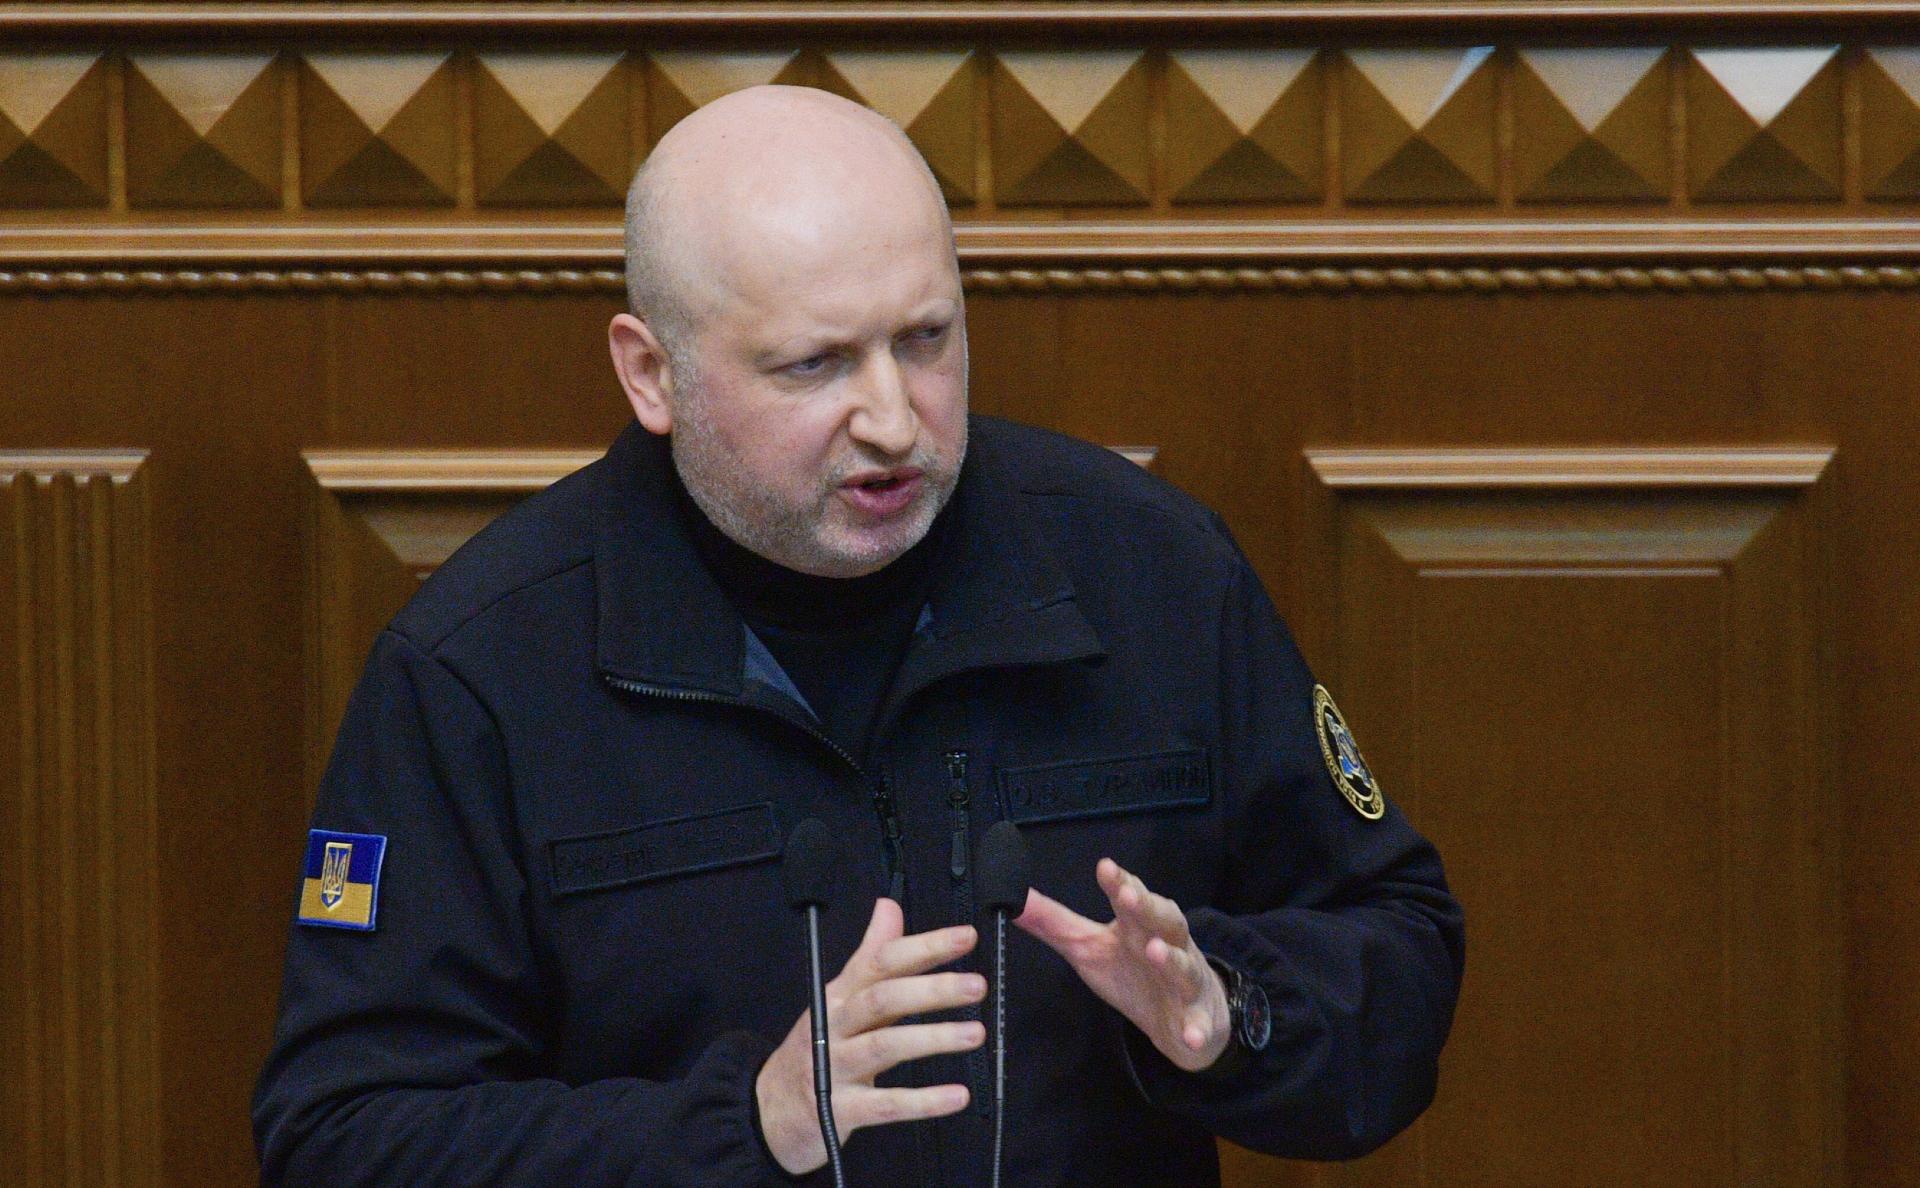 Фото: Николай Лазаренко / РИА Новости